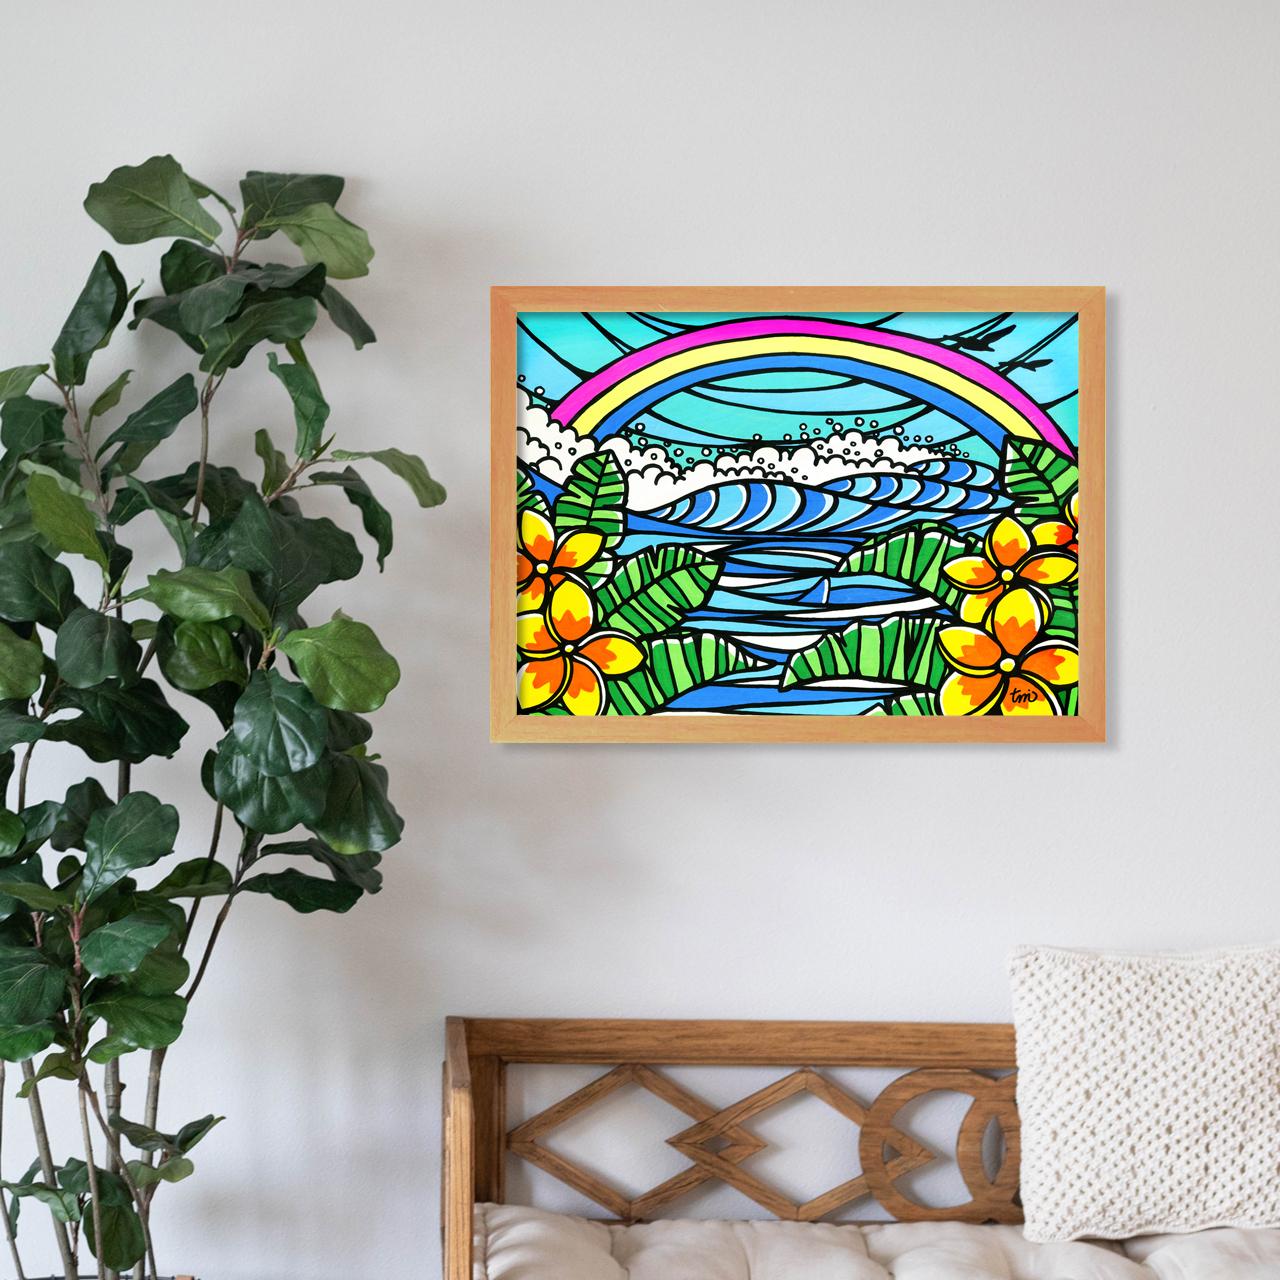 原画 A3(Rainbow Plumeria)